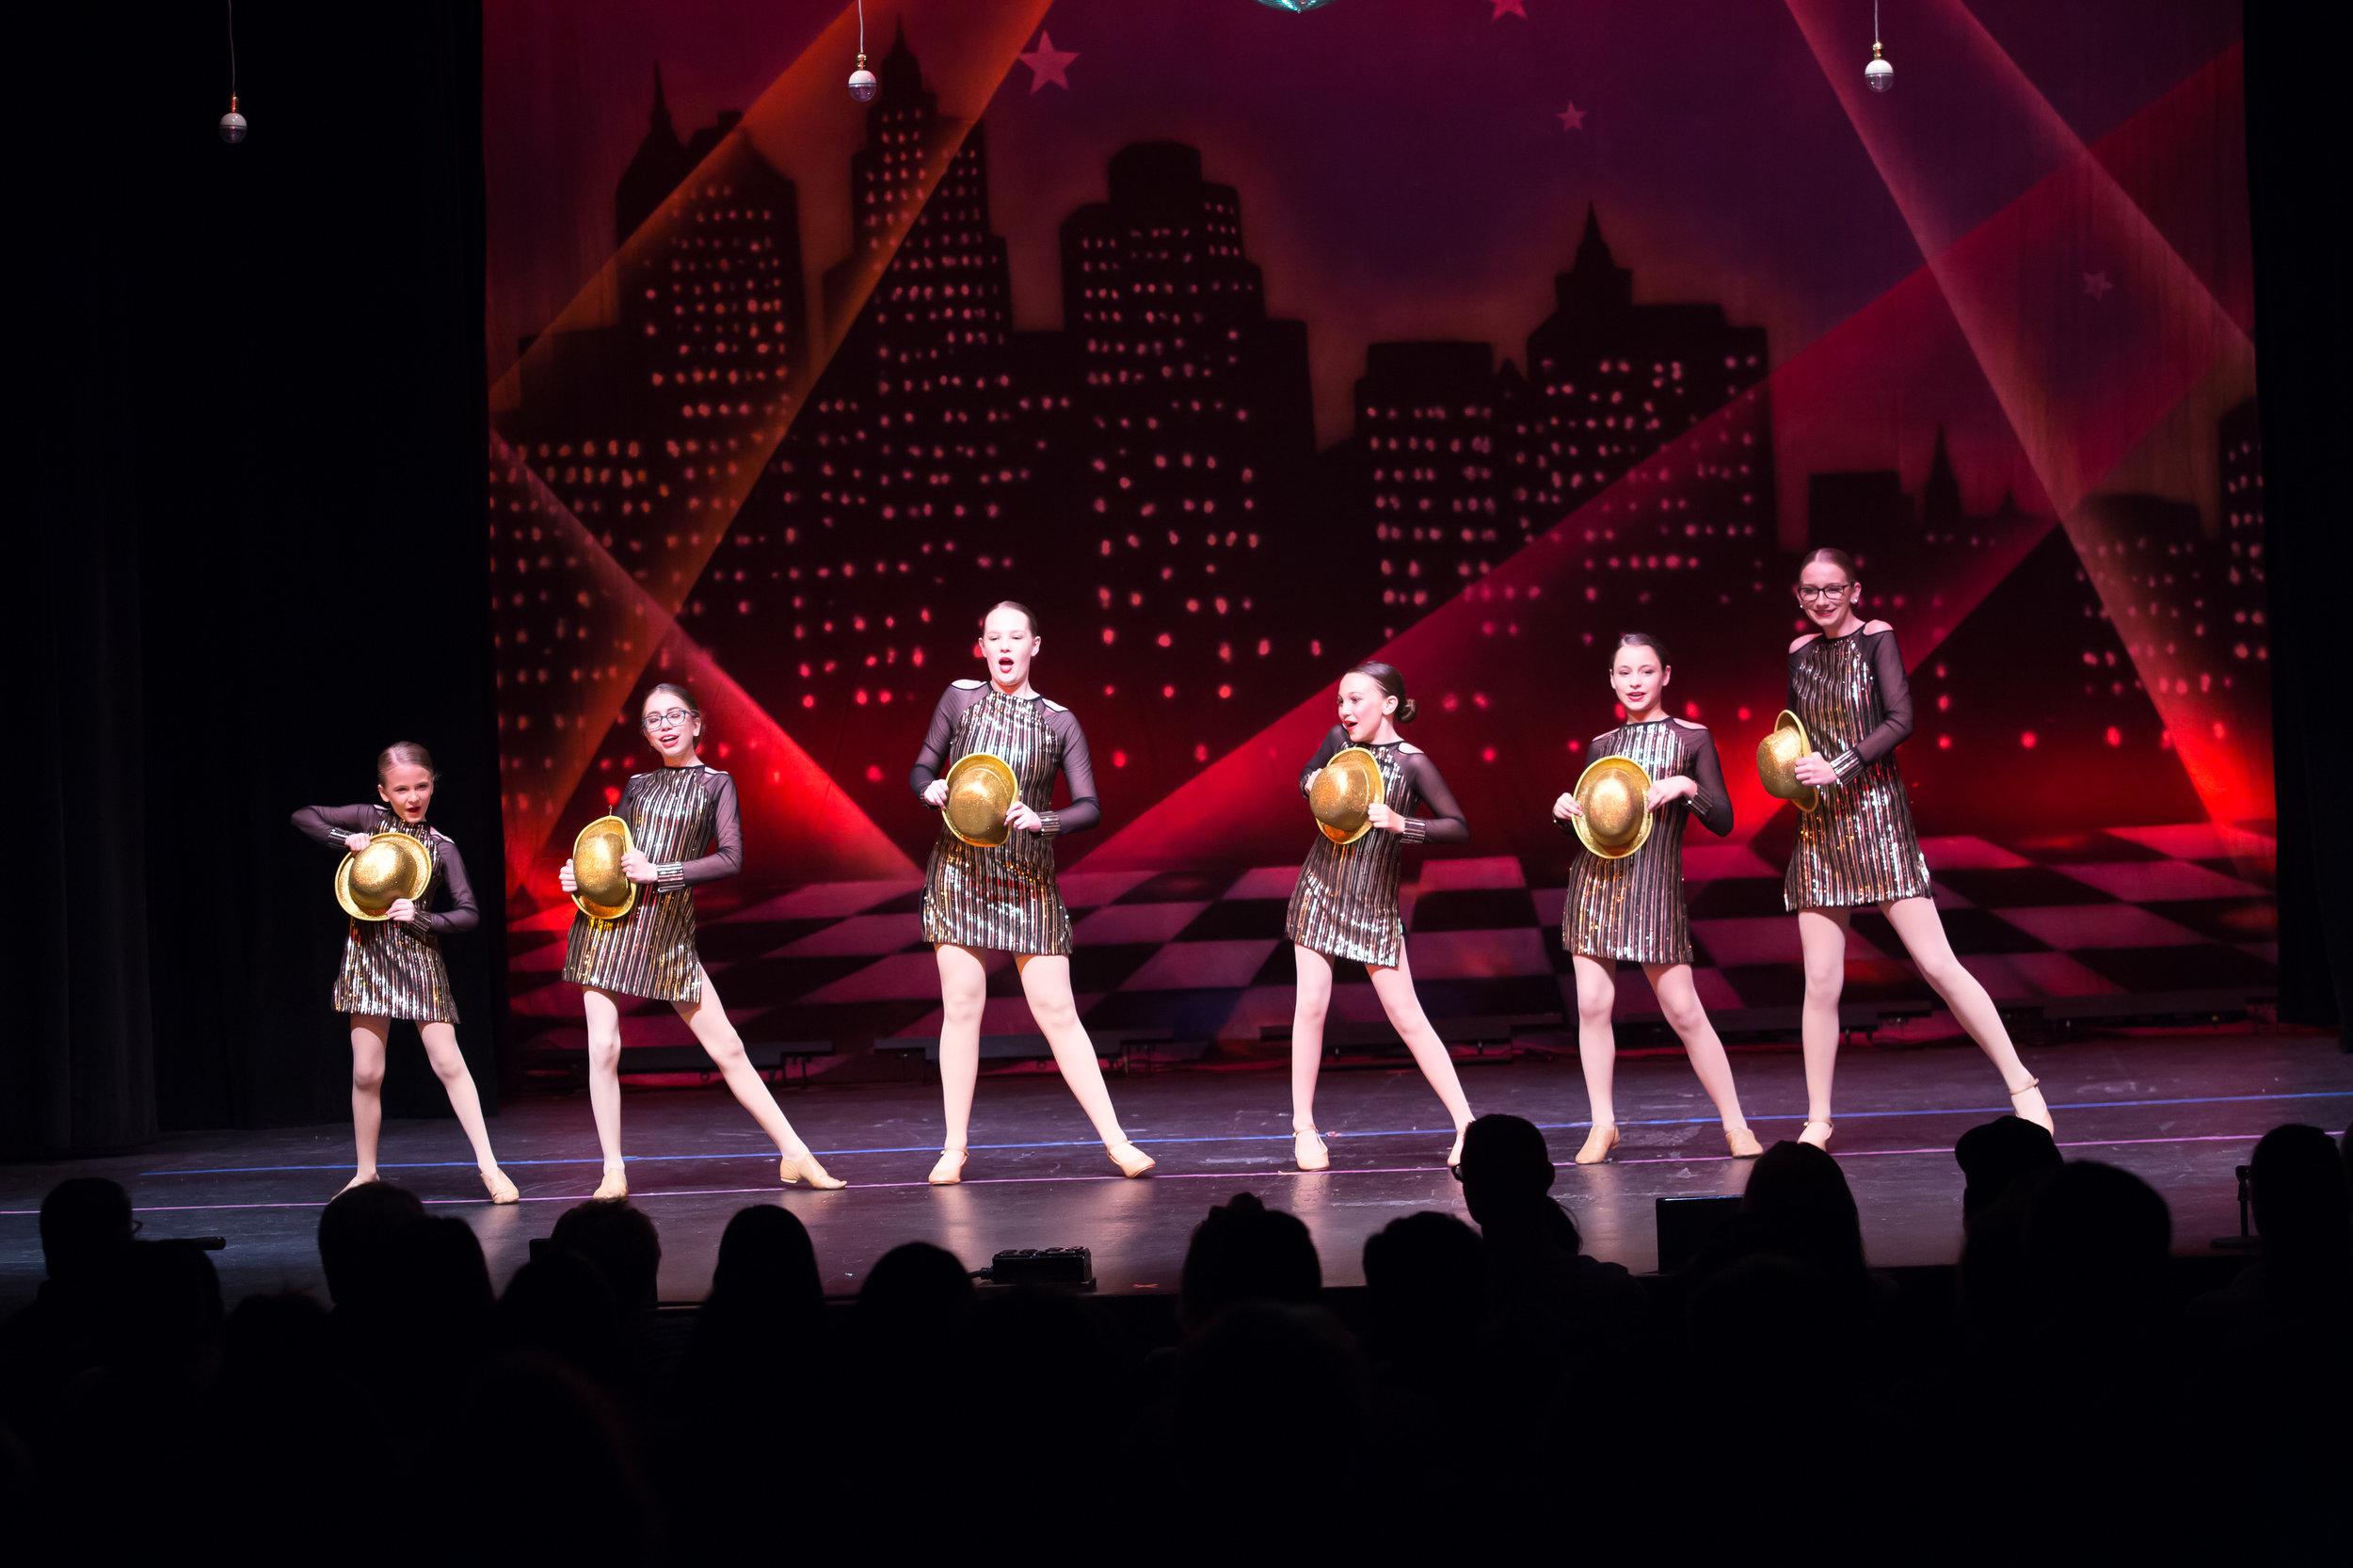 DbD Musical Theatre